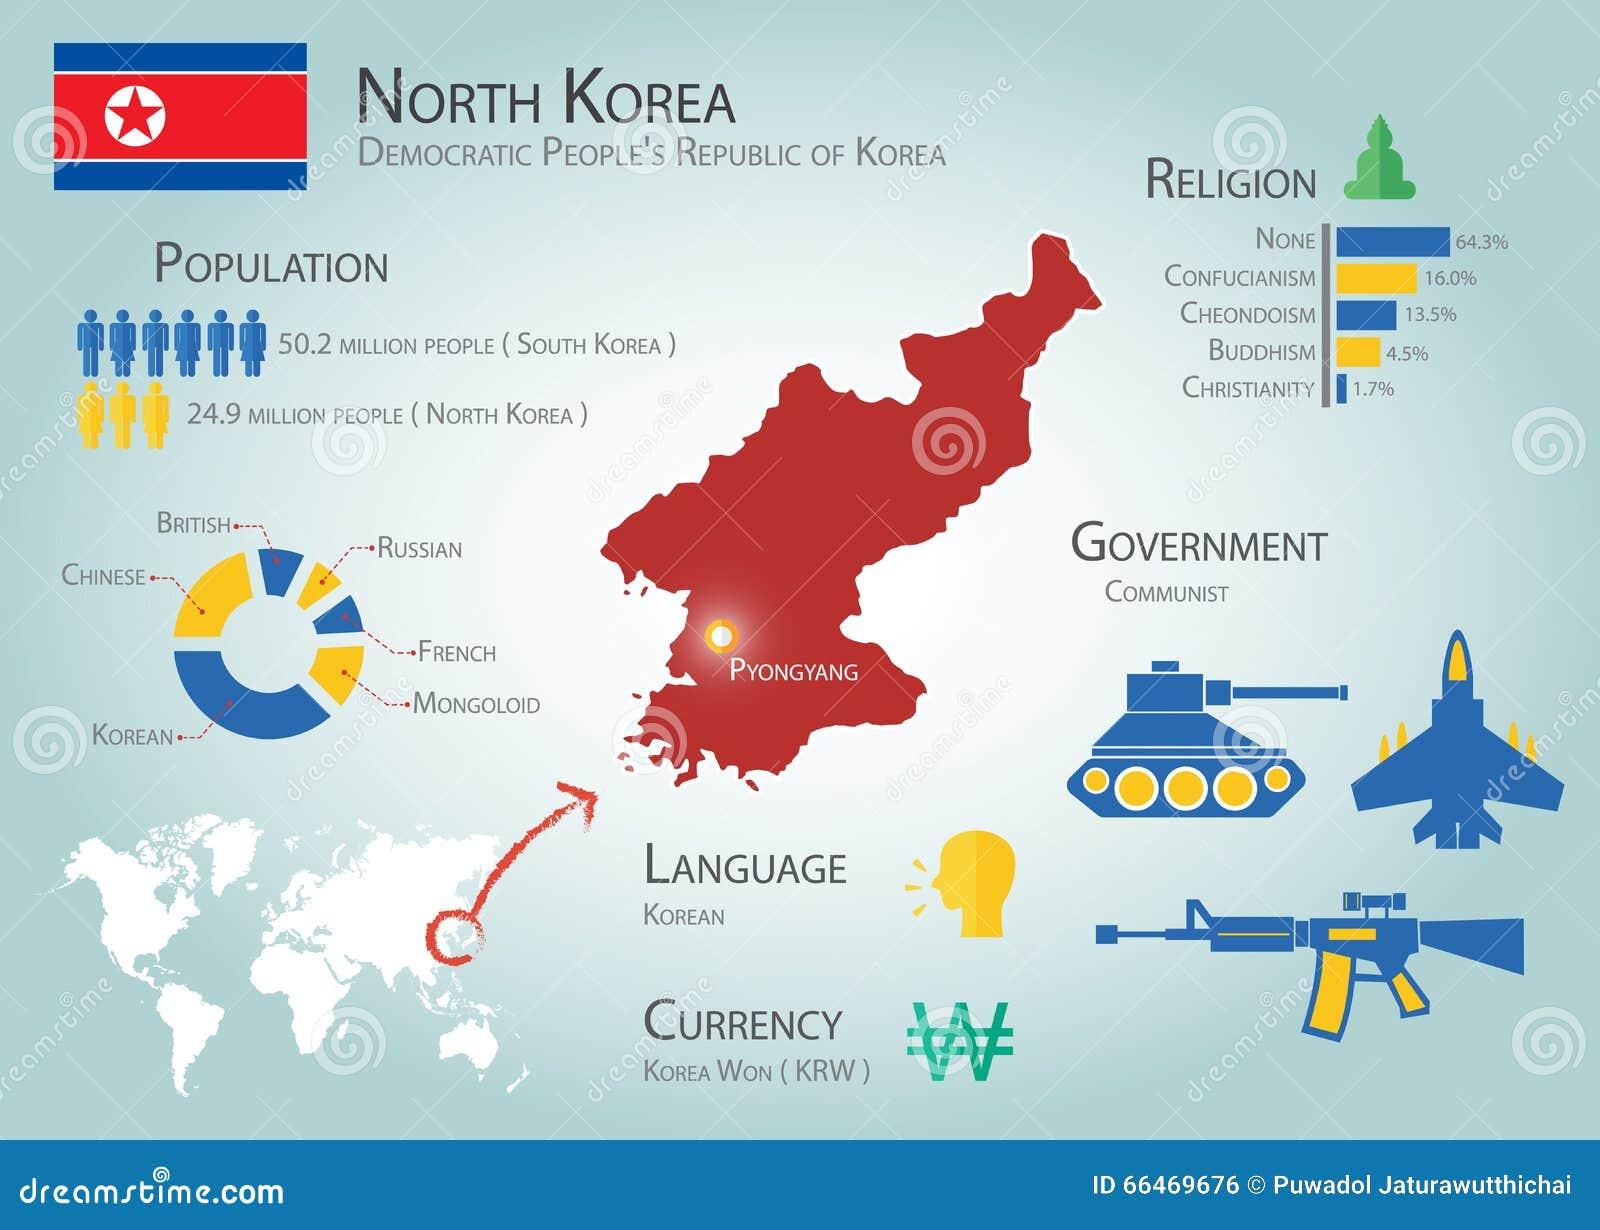 ( Democratic People's Republic of Korea )( Population , Language ...